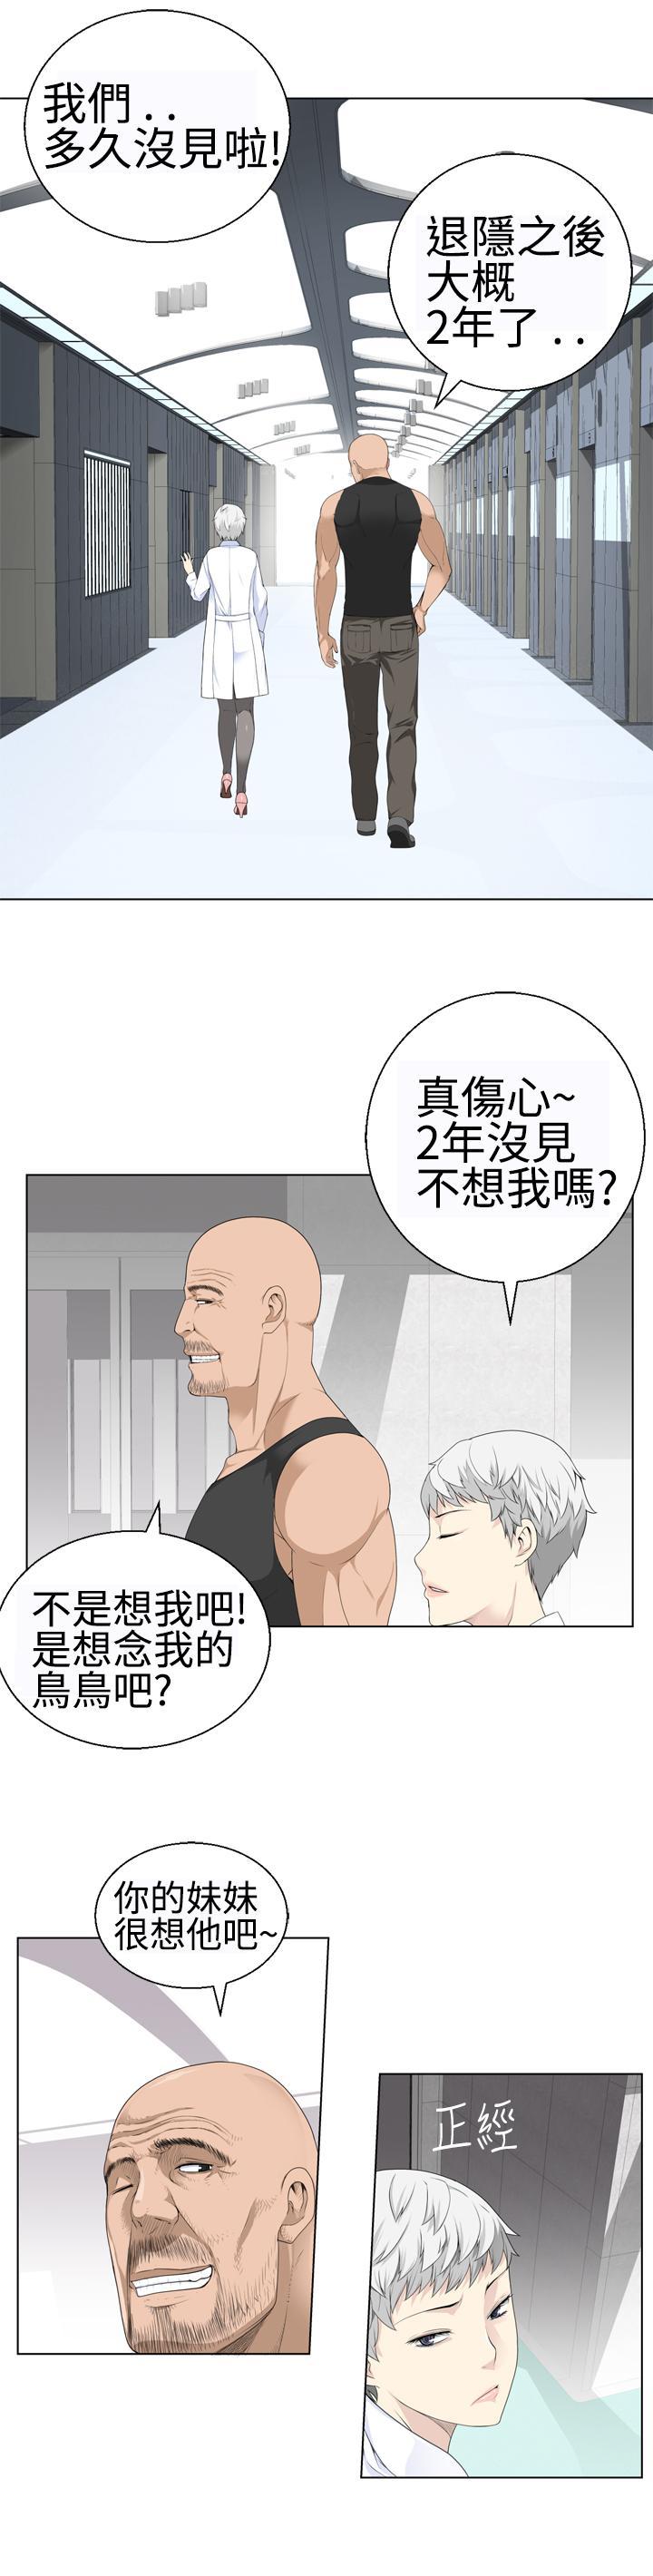 [SOSO] Franken Jo 为爱而生 法兰克赵 Ch.1~19 [Chinese]中文 361